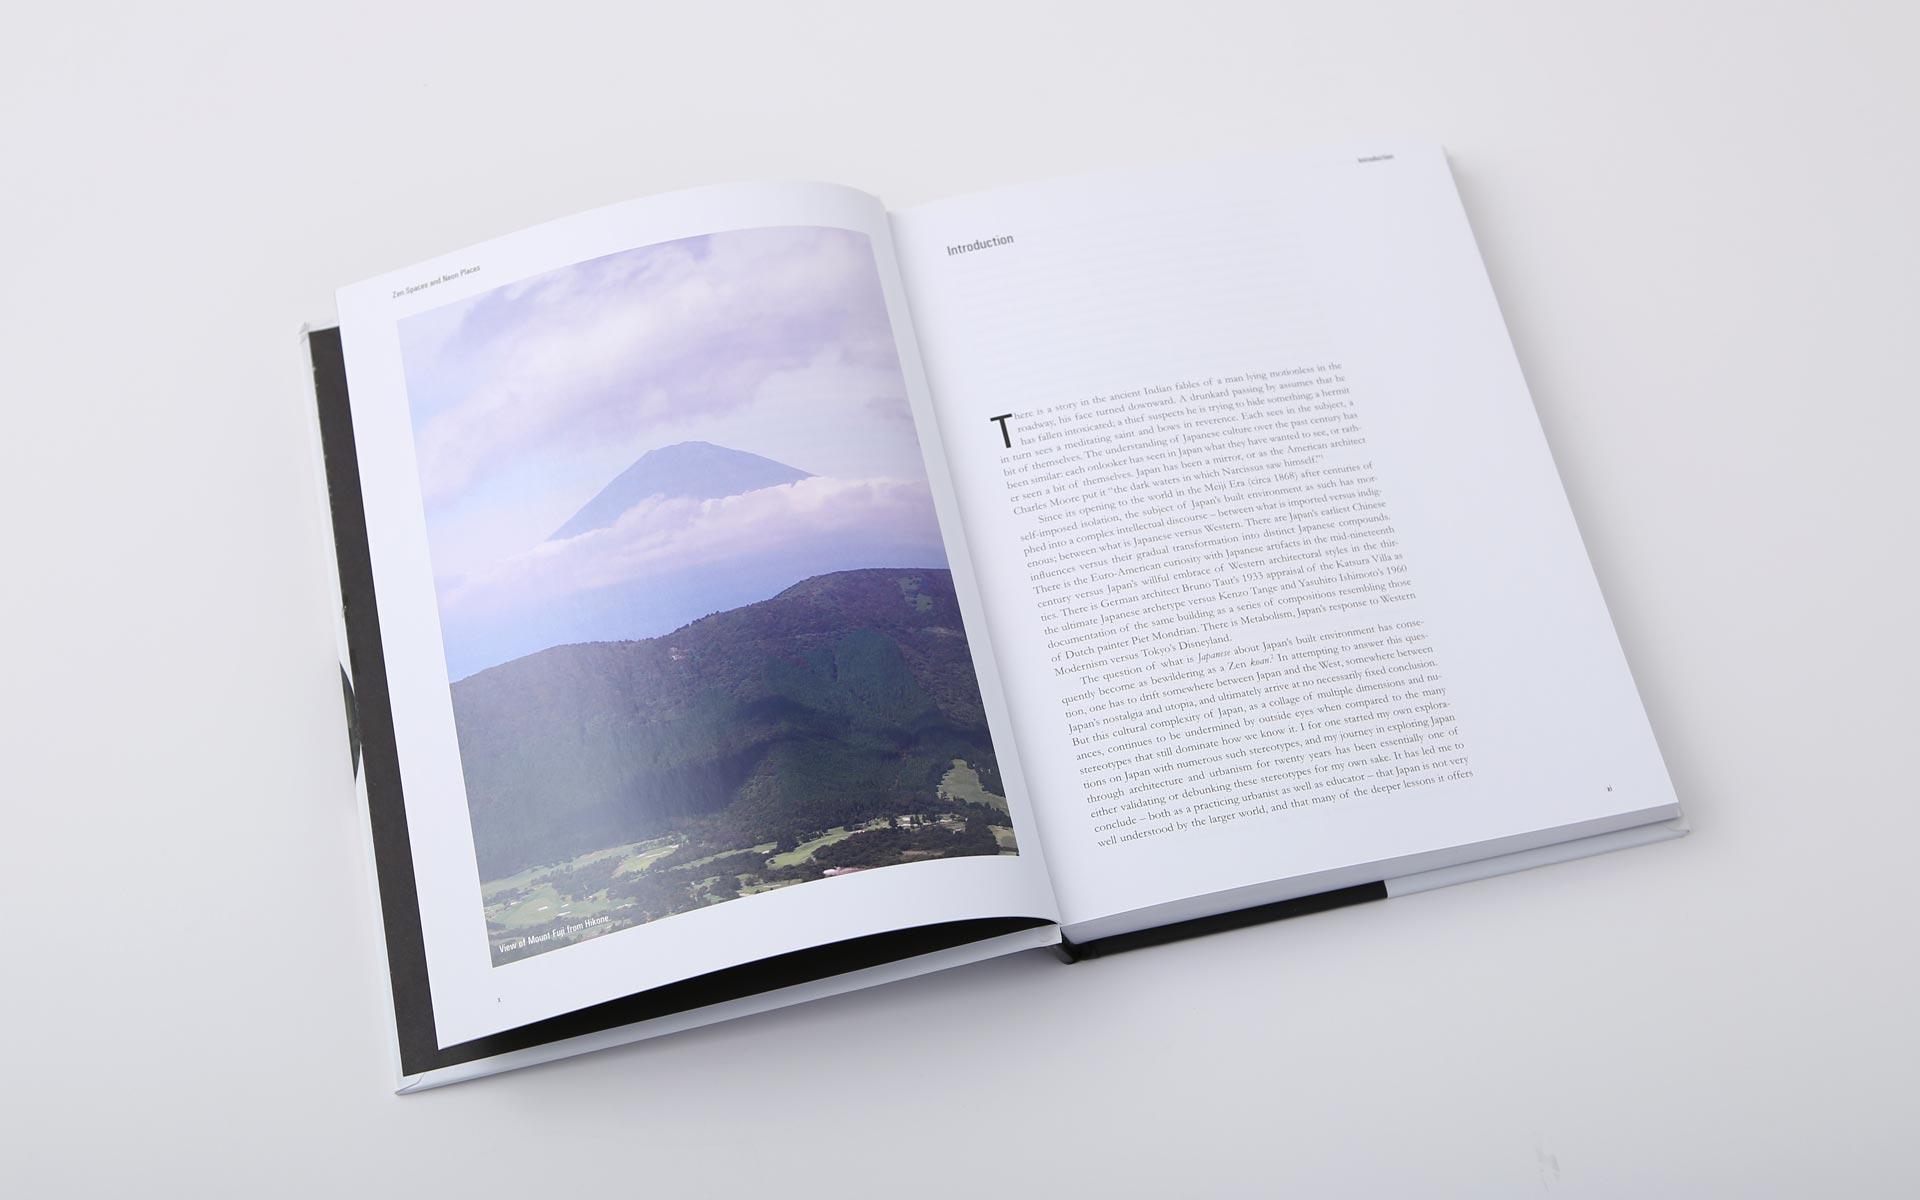 zen-japanese-urbanism-book-design-2